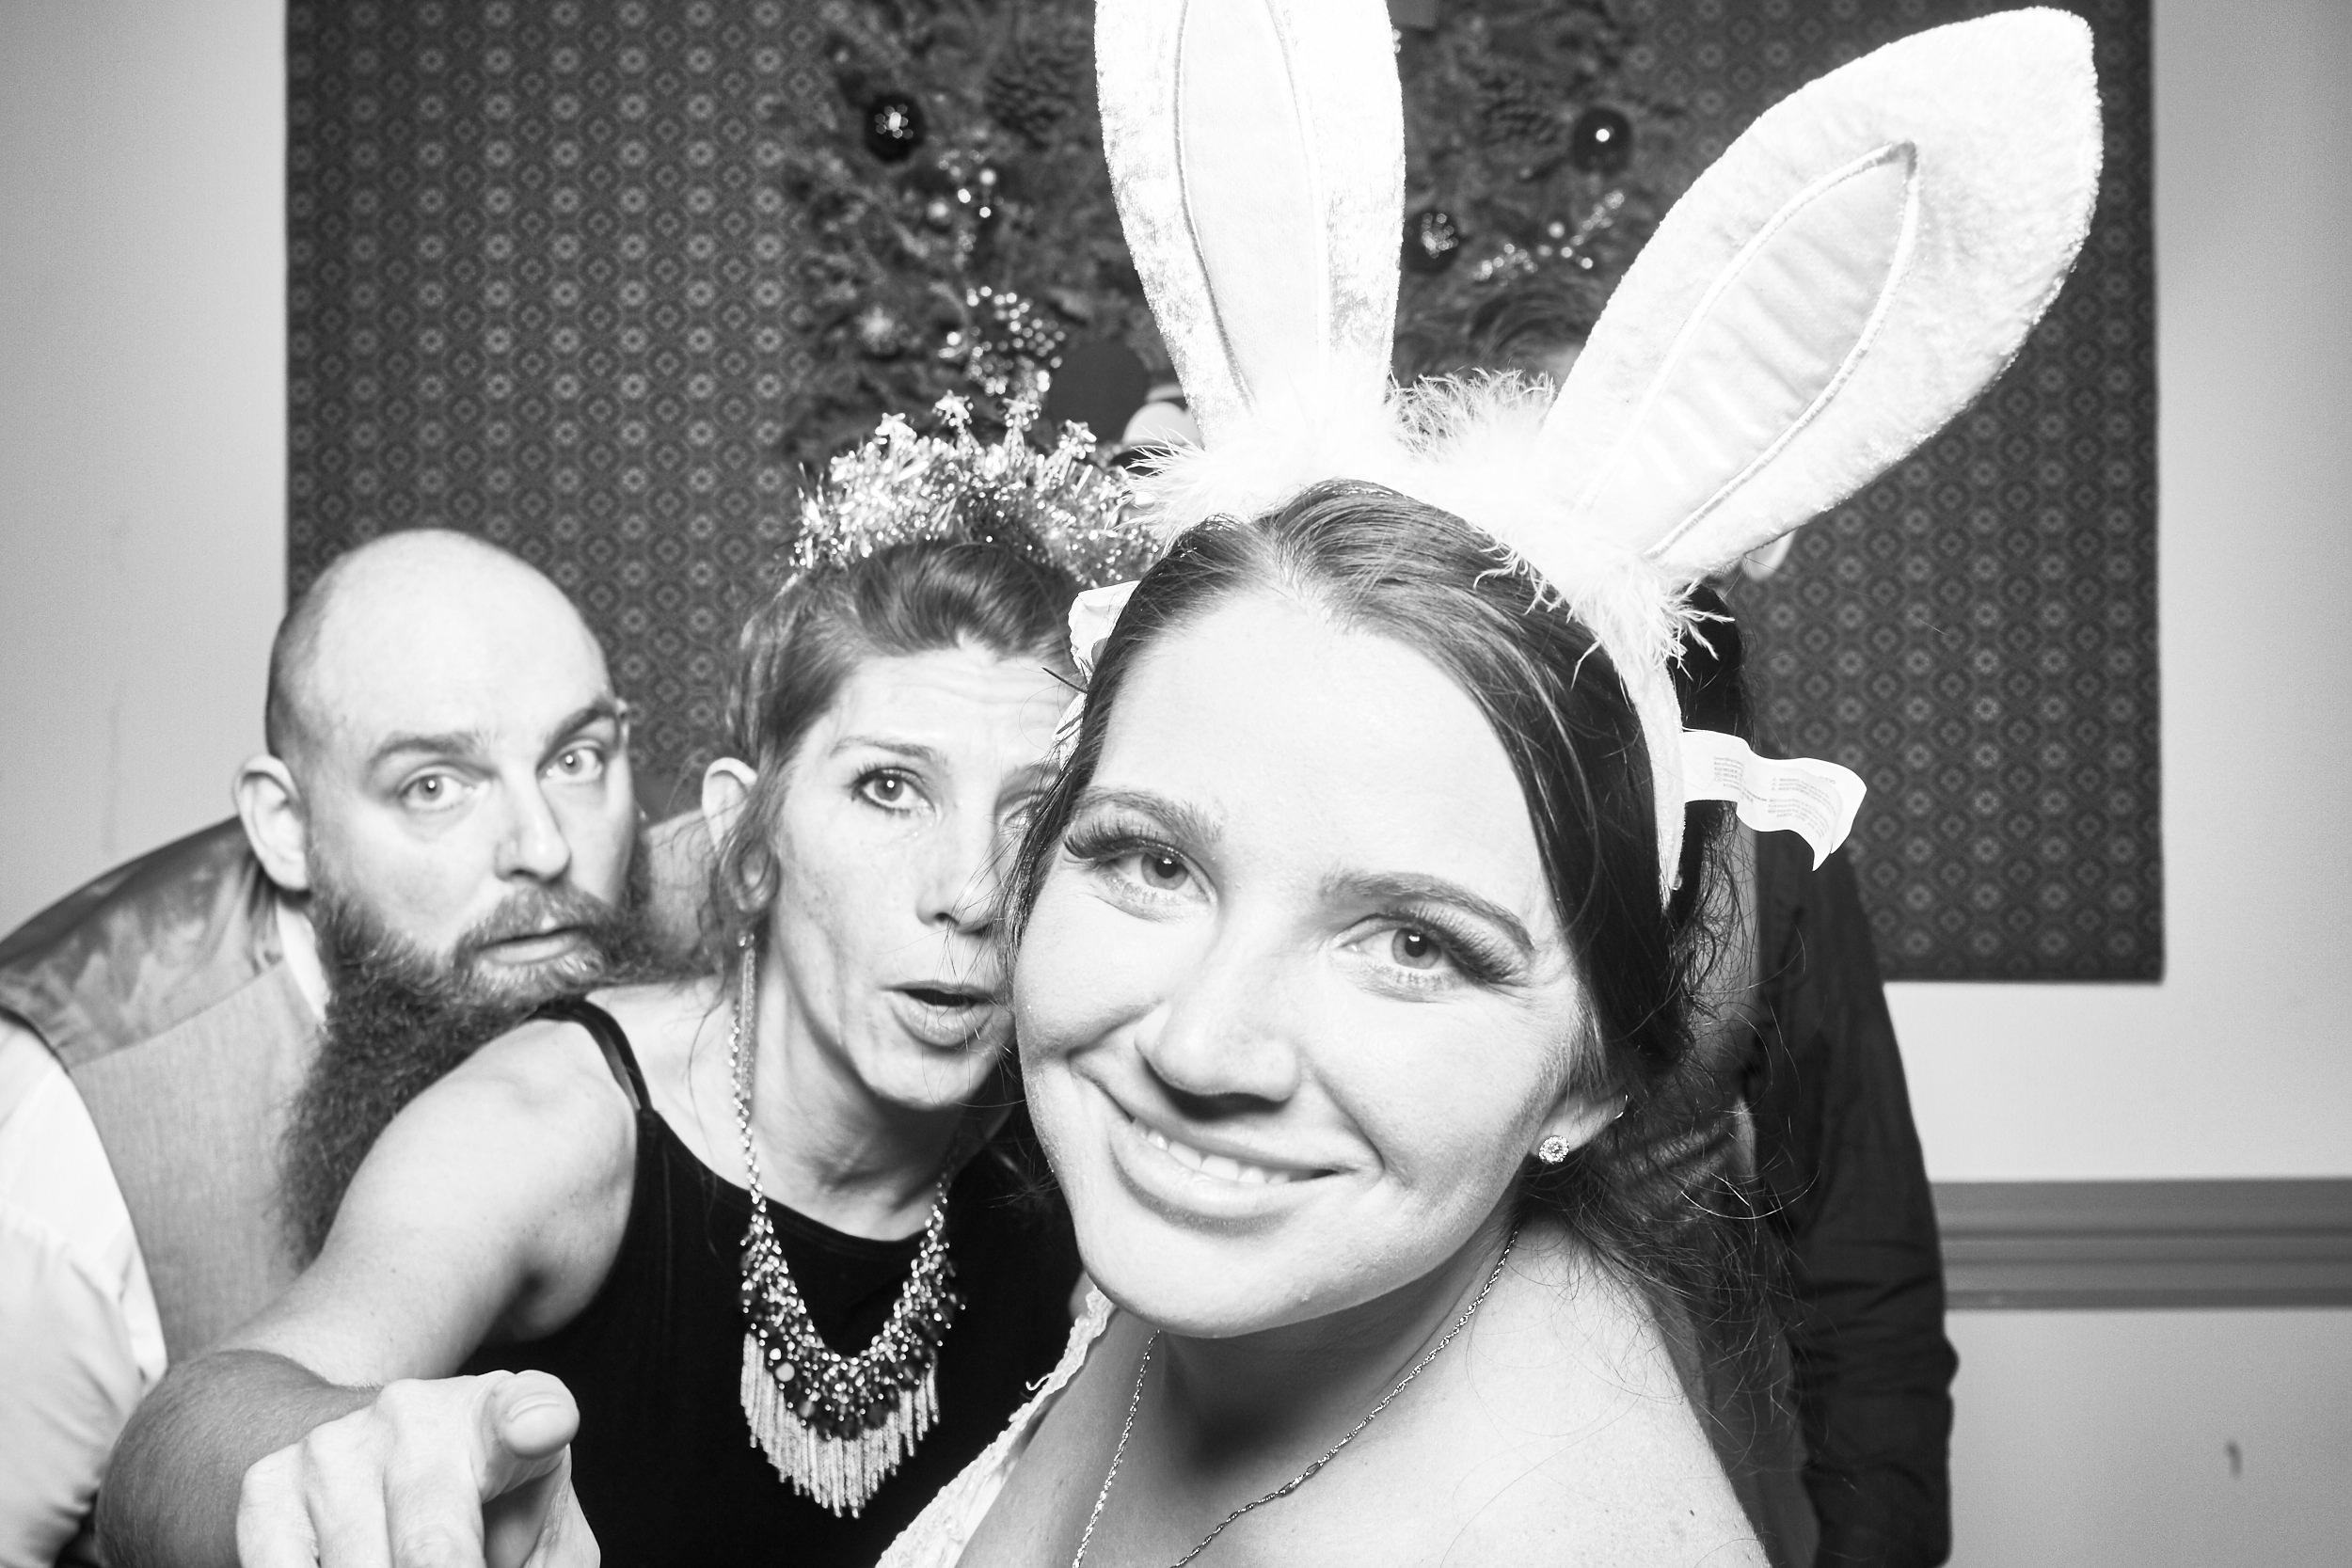 Alexa-James-Wedding-Photo-Booth1003.jpg